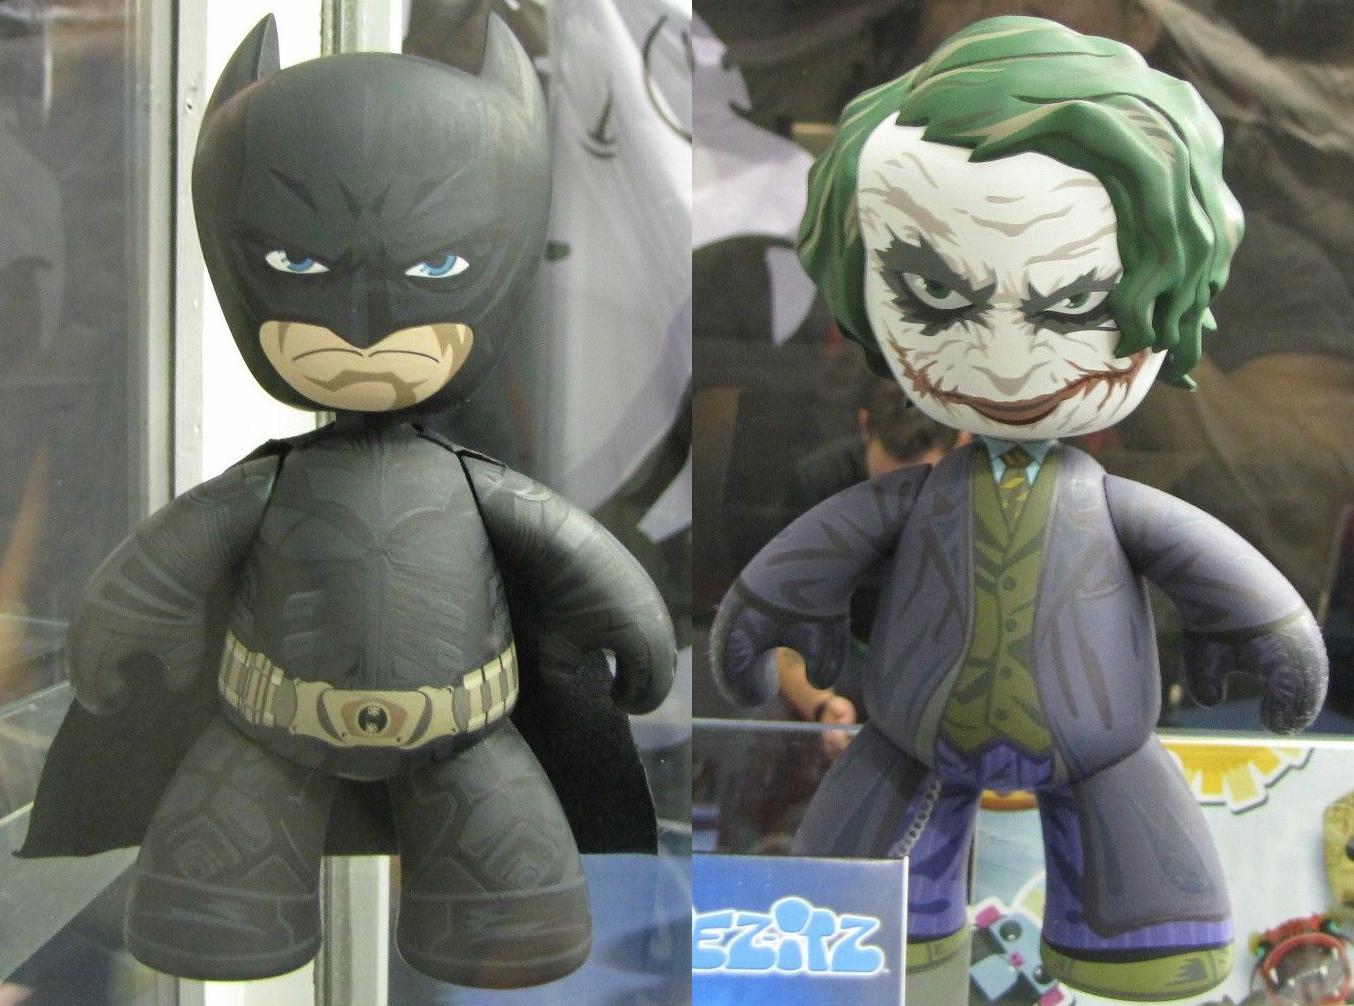 http://3.bp.blogspot.com/_eP-TQH6WbX0/TEhvsmxi6VI/AAAAAAAALZA/CIe20MDK4io/s1600/FIRST+LOOK+DC+Universe+The+Dark+Knight+Batman+and+The+Joker+Mez-Itz+Vinyl+Figure+2+Pack.jpg